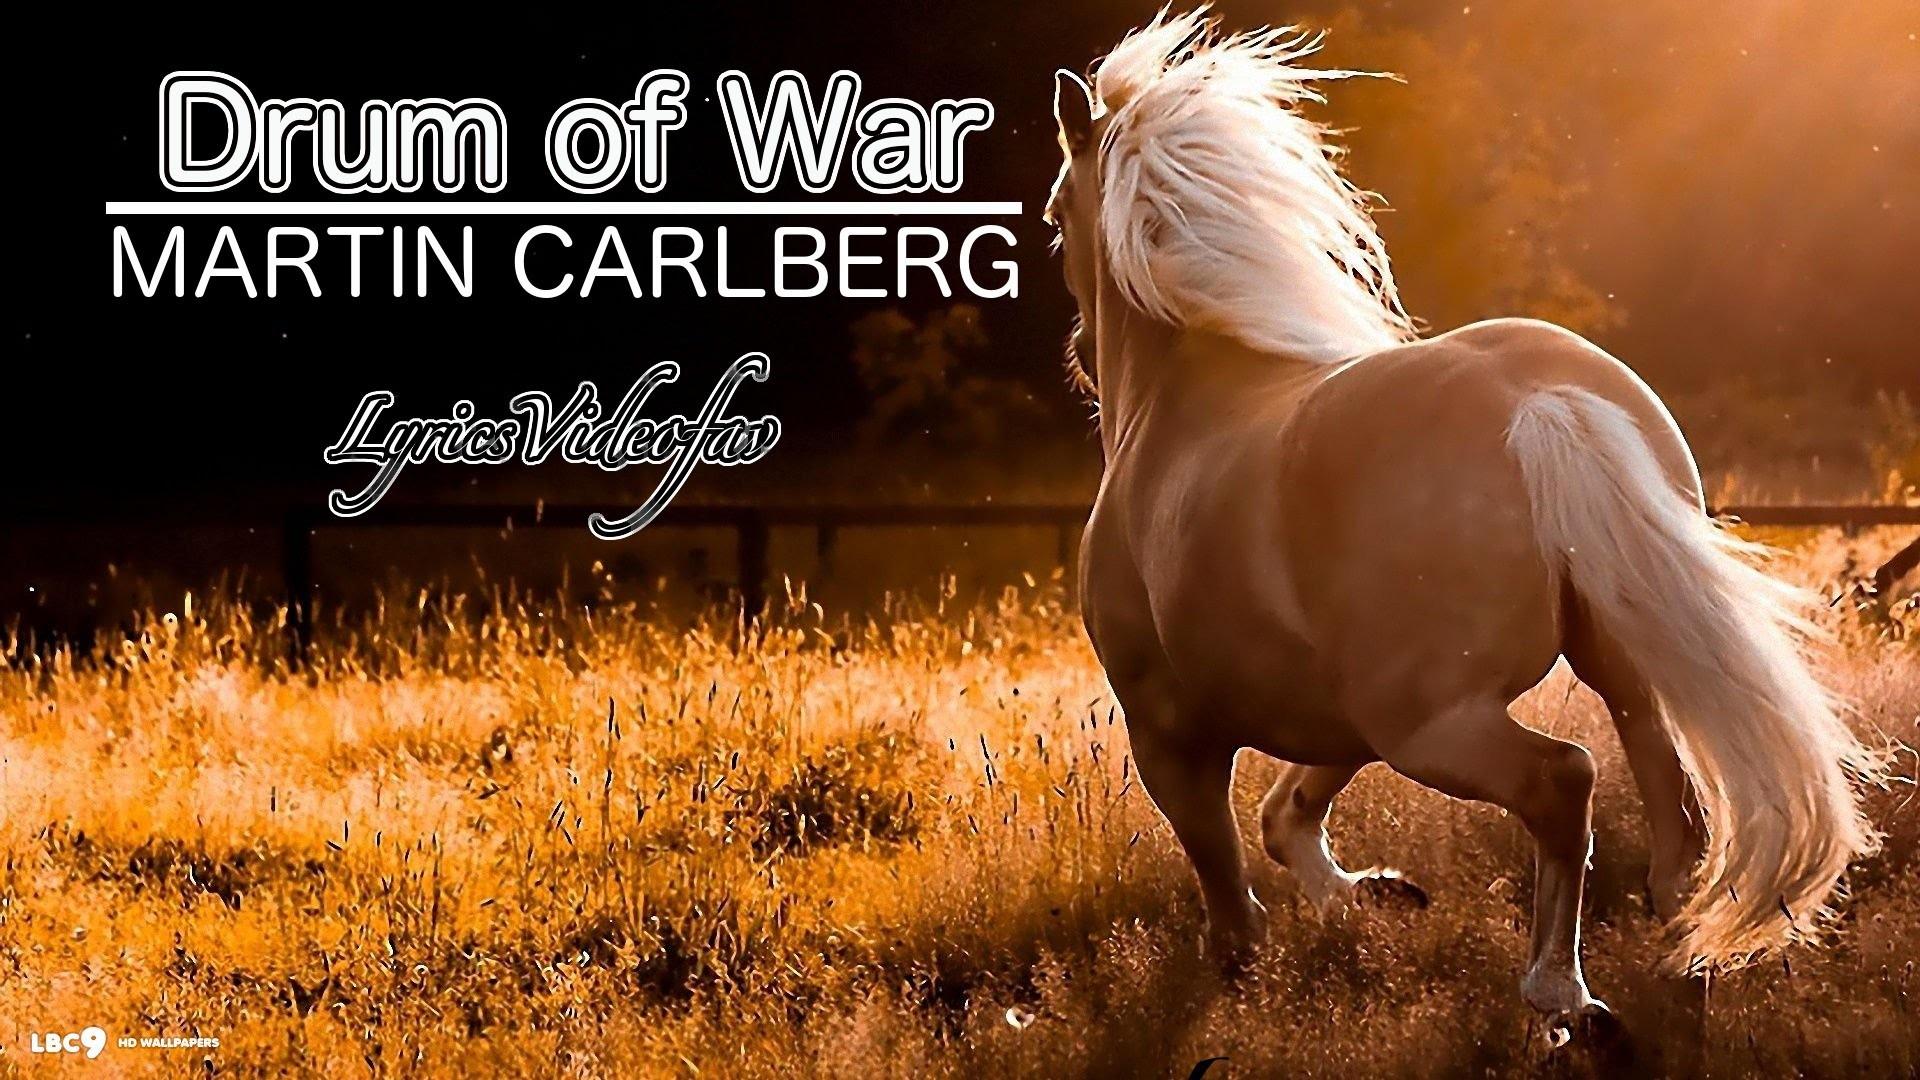 Drums Of War – Martin Carlberg (Modern Country Music) @LyricsVideoFav